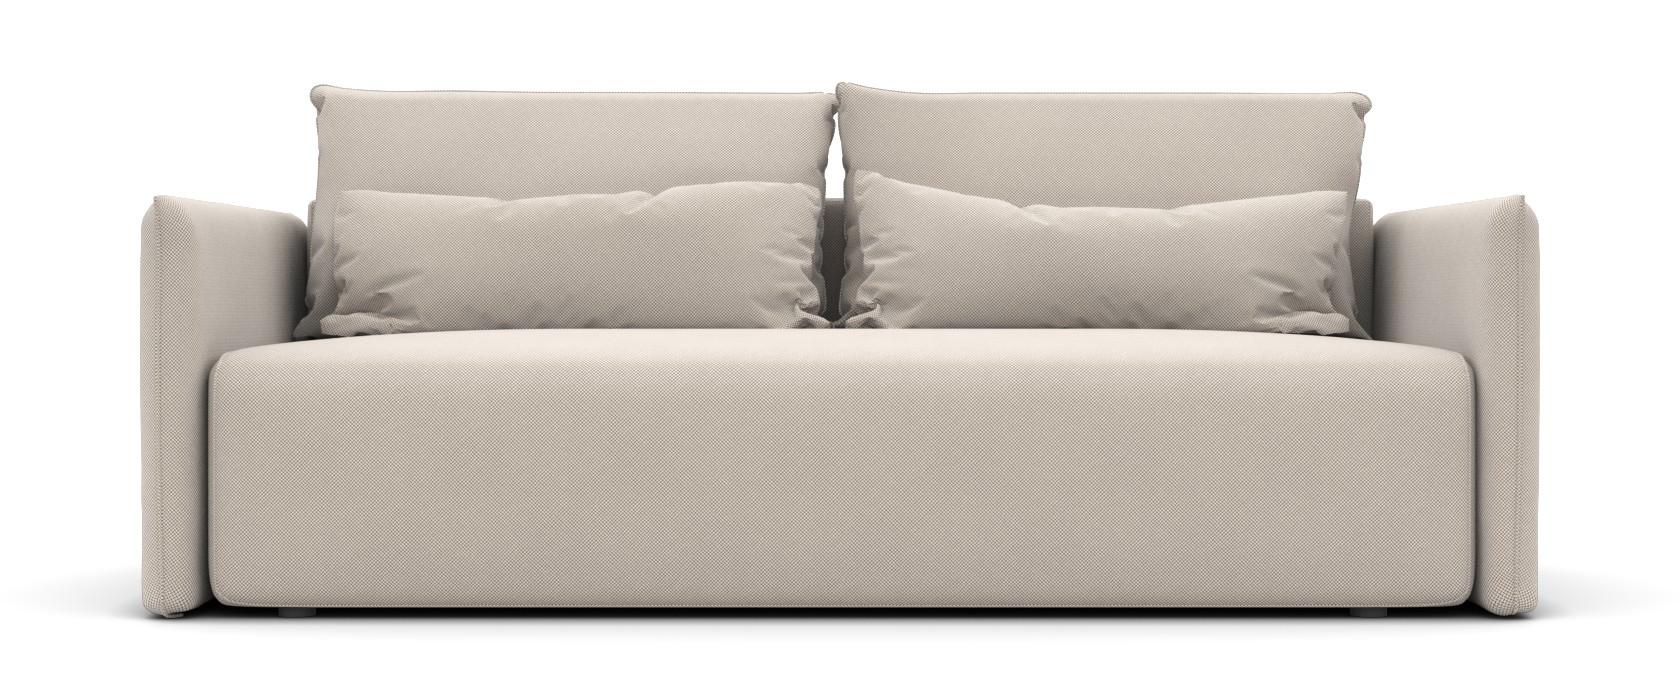 Тримісний диван Laura - Pufetto